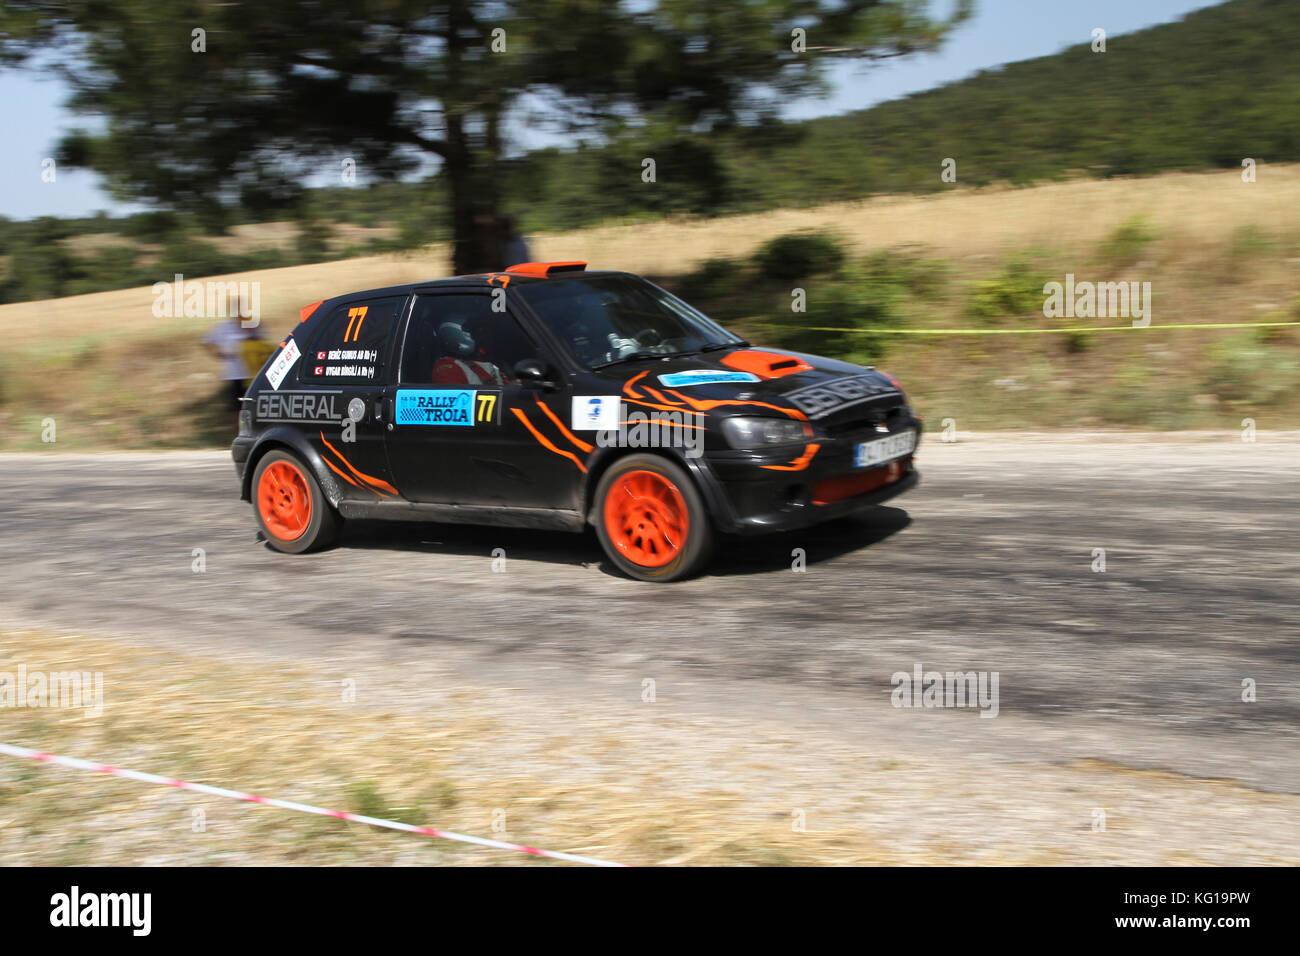 Canakkale Turkey July 01 2017 Uygar Bilgili Drives Peugeot 106 Stock Photo Alamy